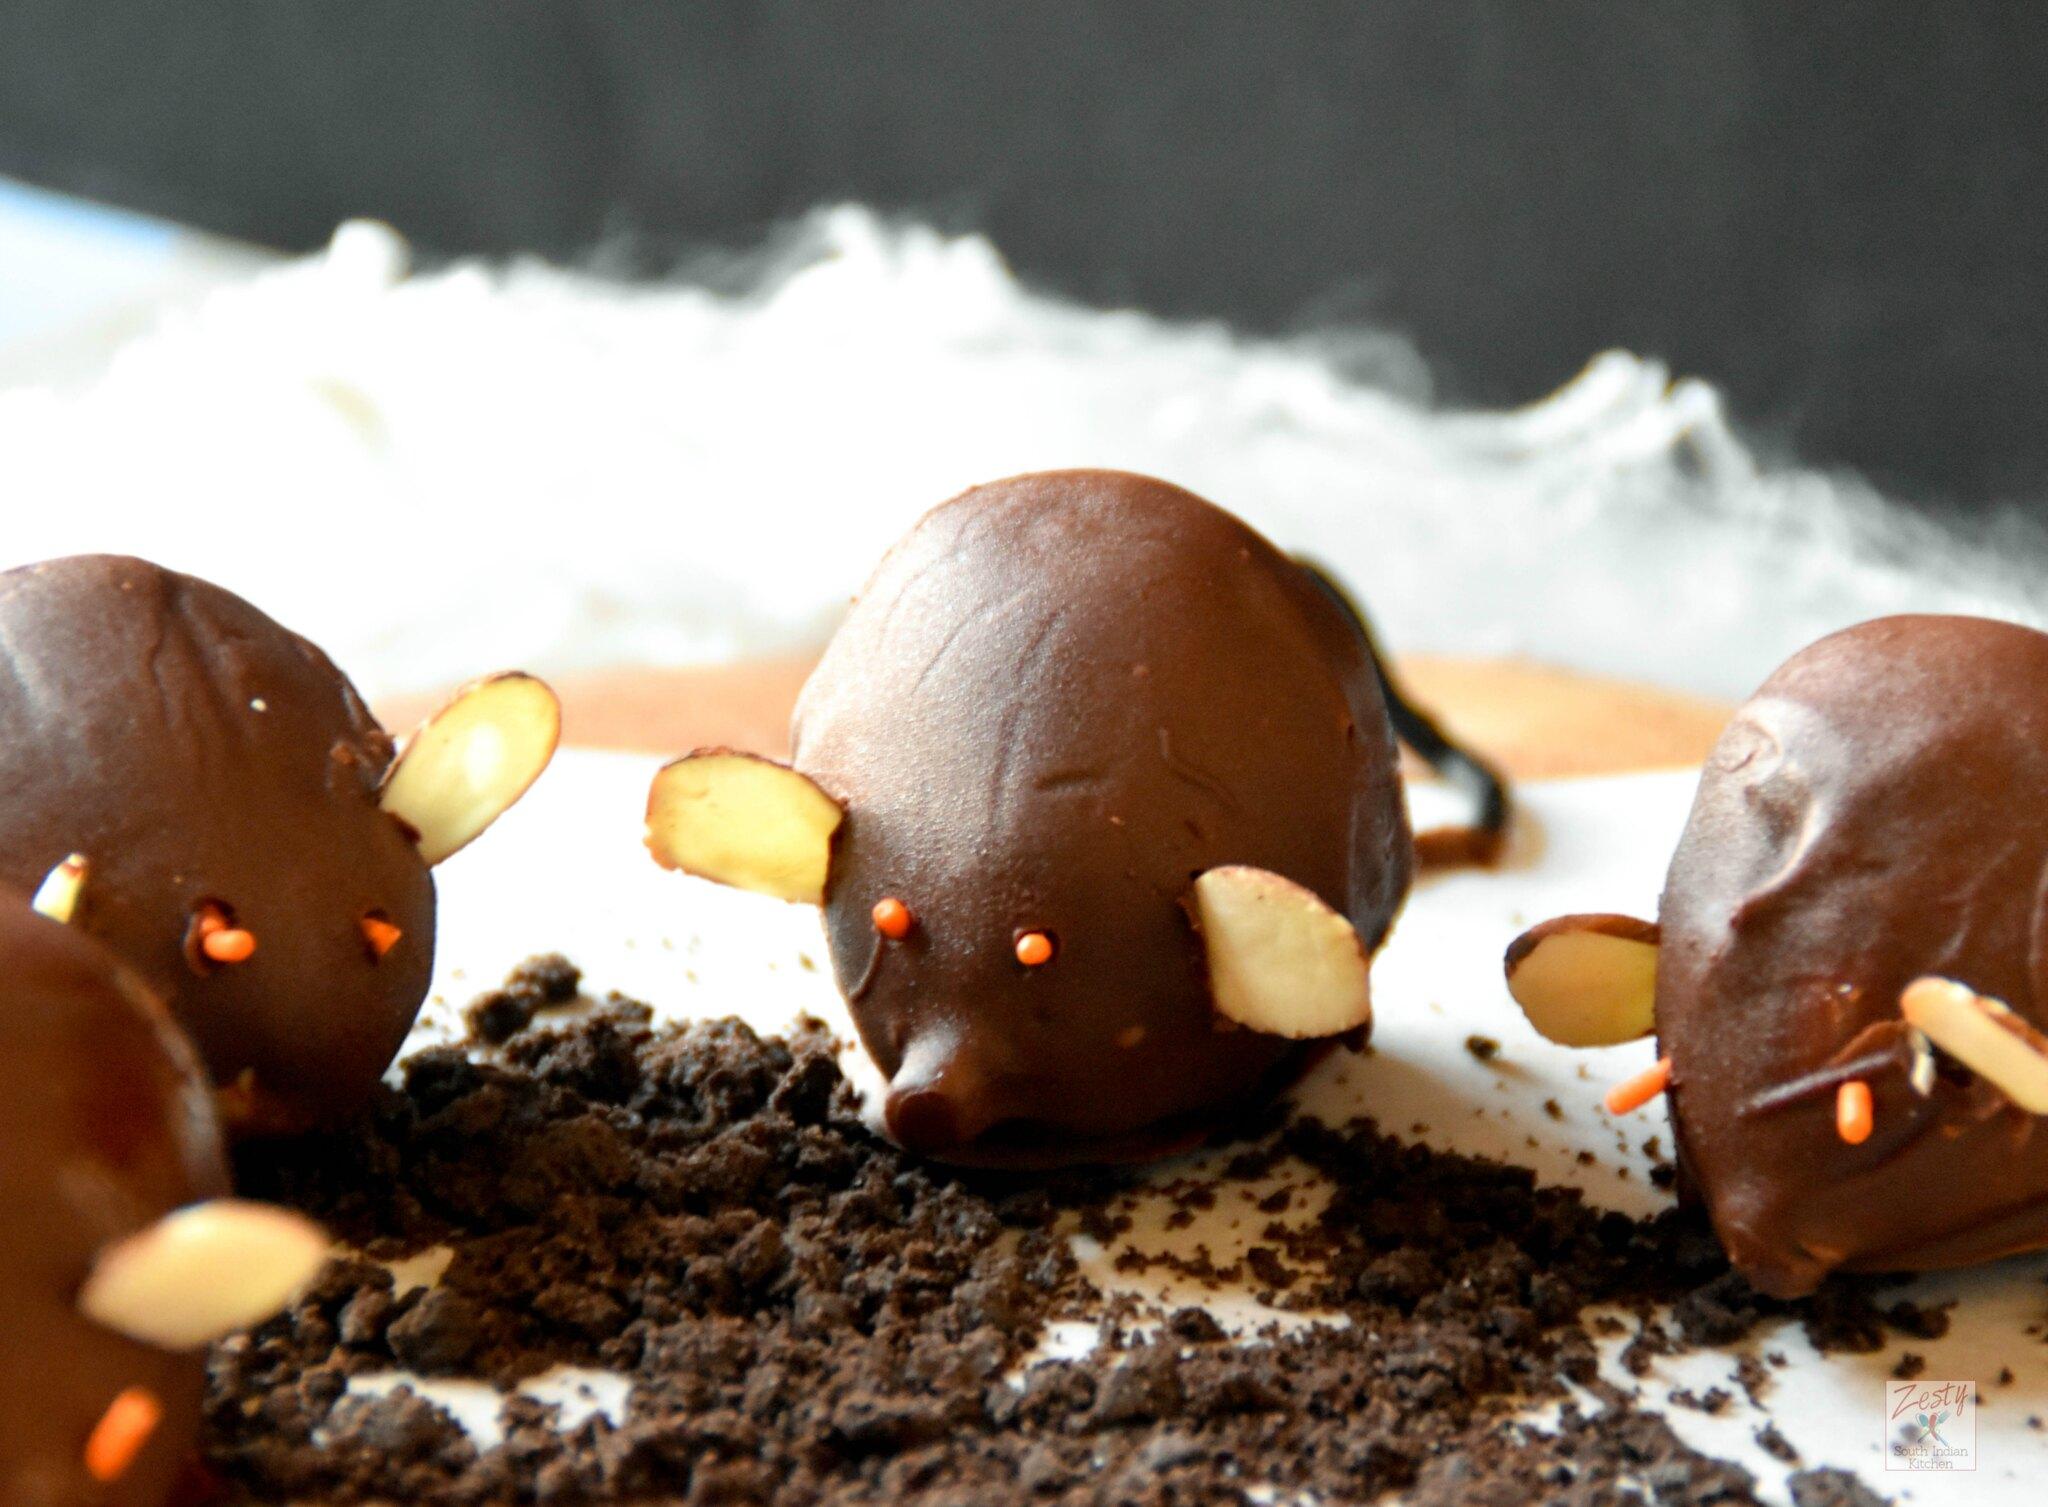 "<img src=""https://cdn.shortpixel.ai/client/q_glossy,ret_img,w_2048,h_1507/Chocolate fig mice.jpg"" alt="" Chocolate fig mice 3"">"